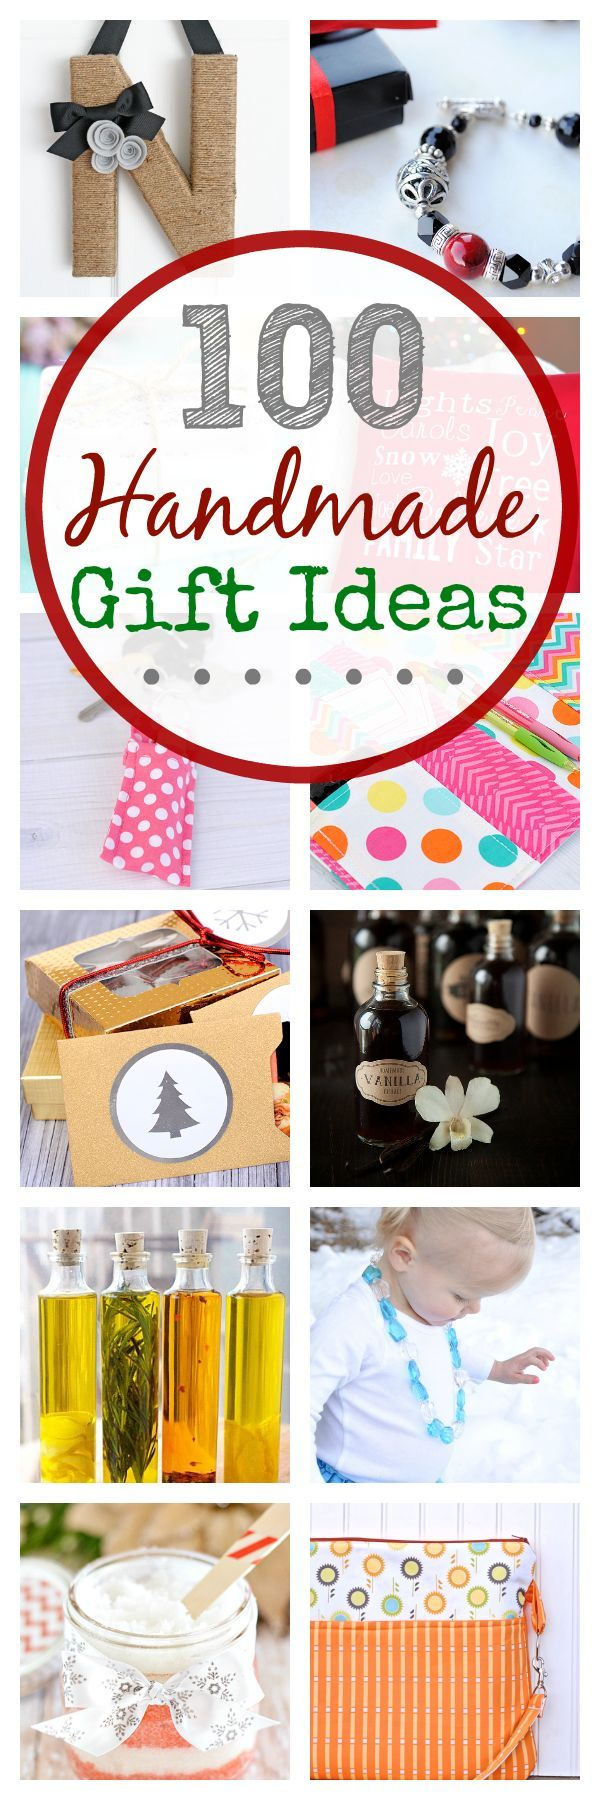 100 Handmade Gift Ideas (for kids, women, men, teens and more)